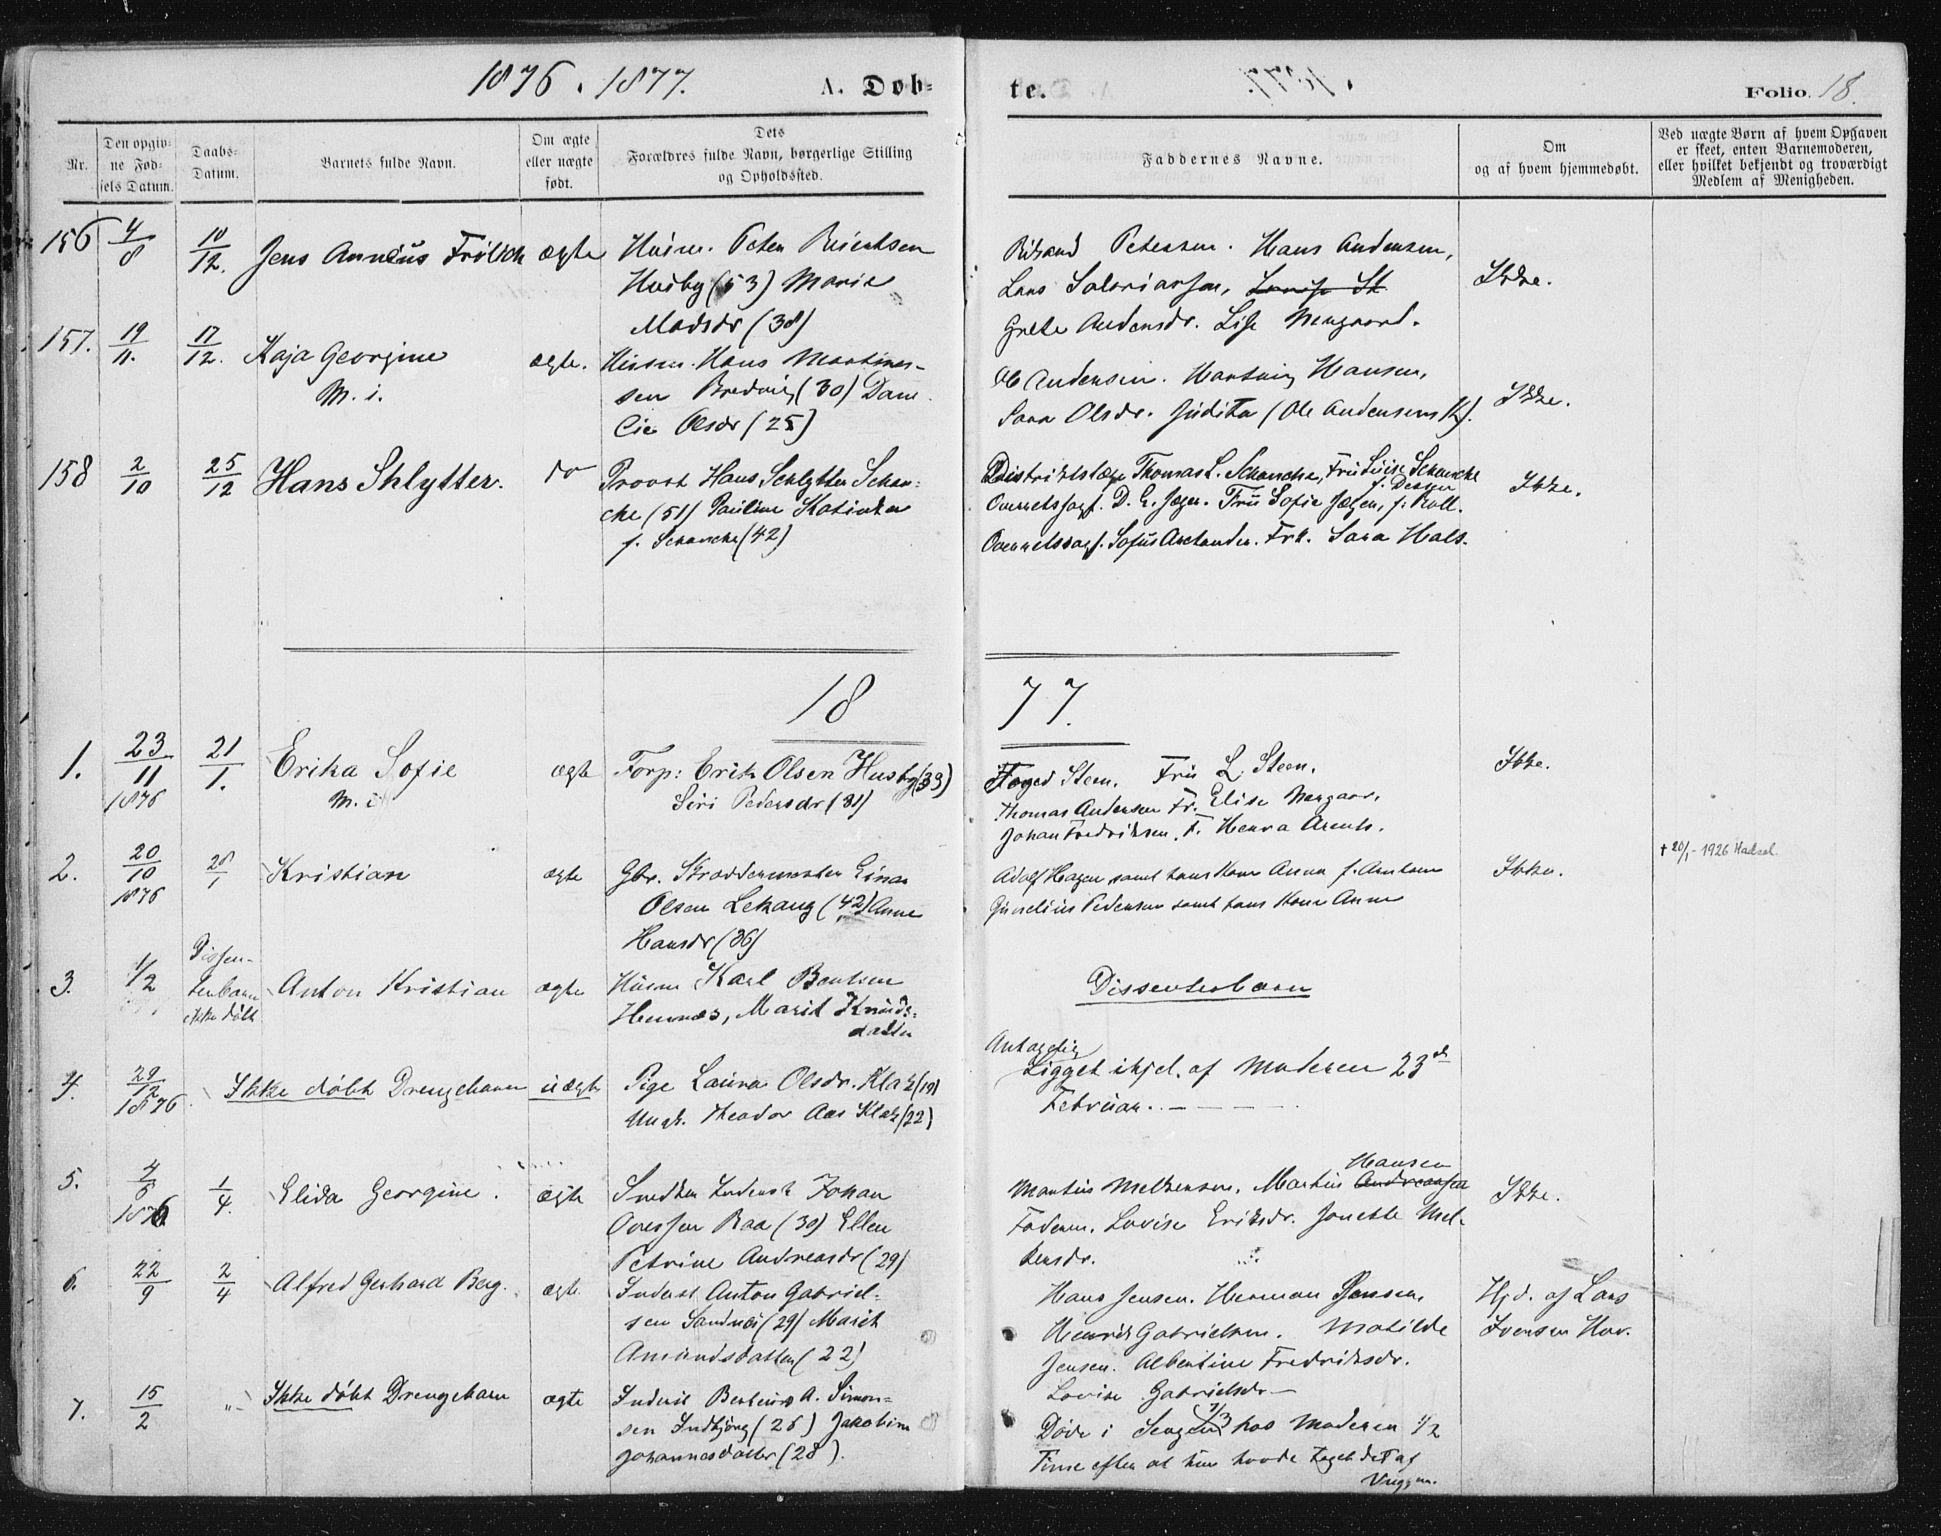 SAT, Ministerialprotokoller, klokkerbøker og fødselsregistre - Nordland, 888/L1243: Ministerialbok nr. 888A09, 1876-1879, s. 18